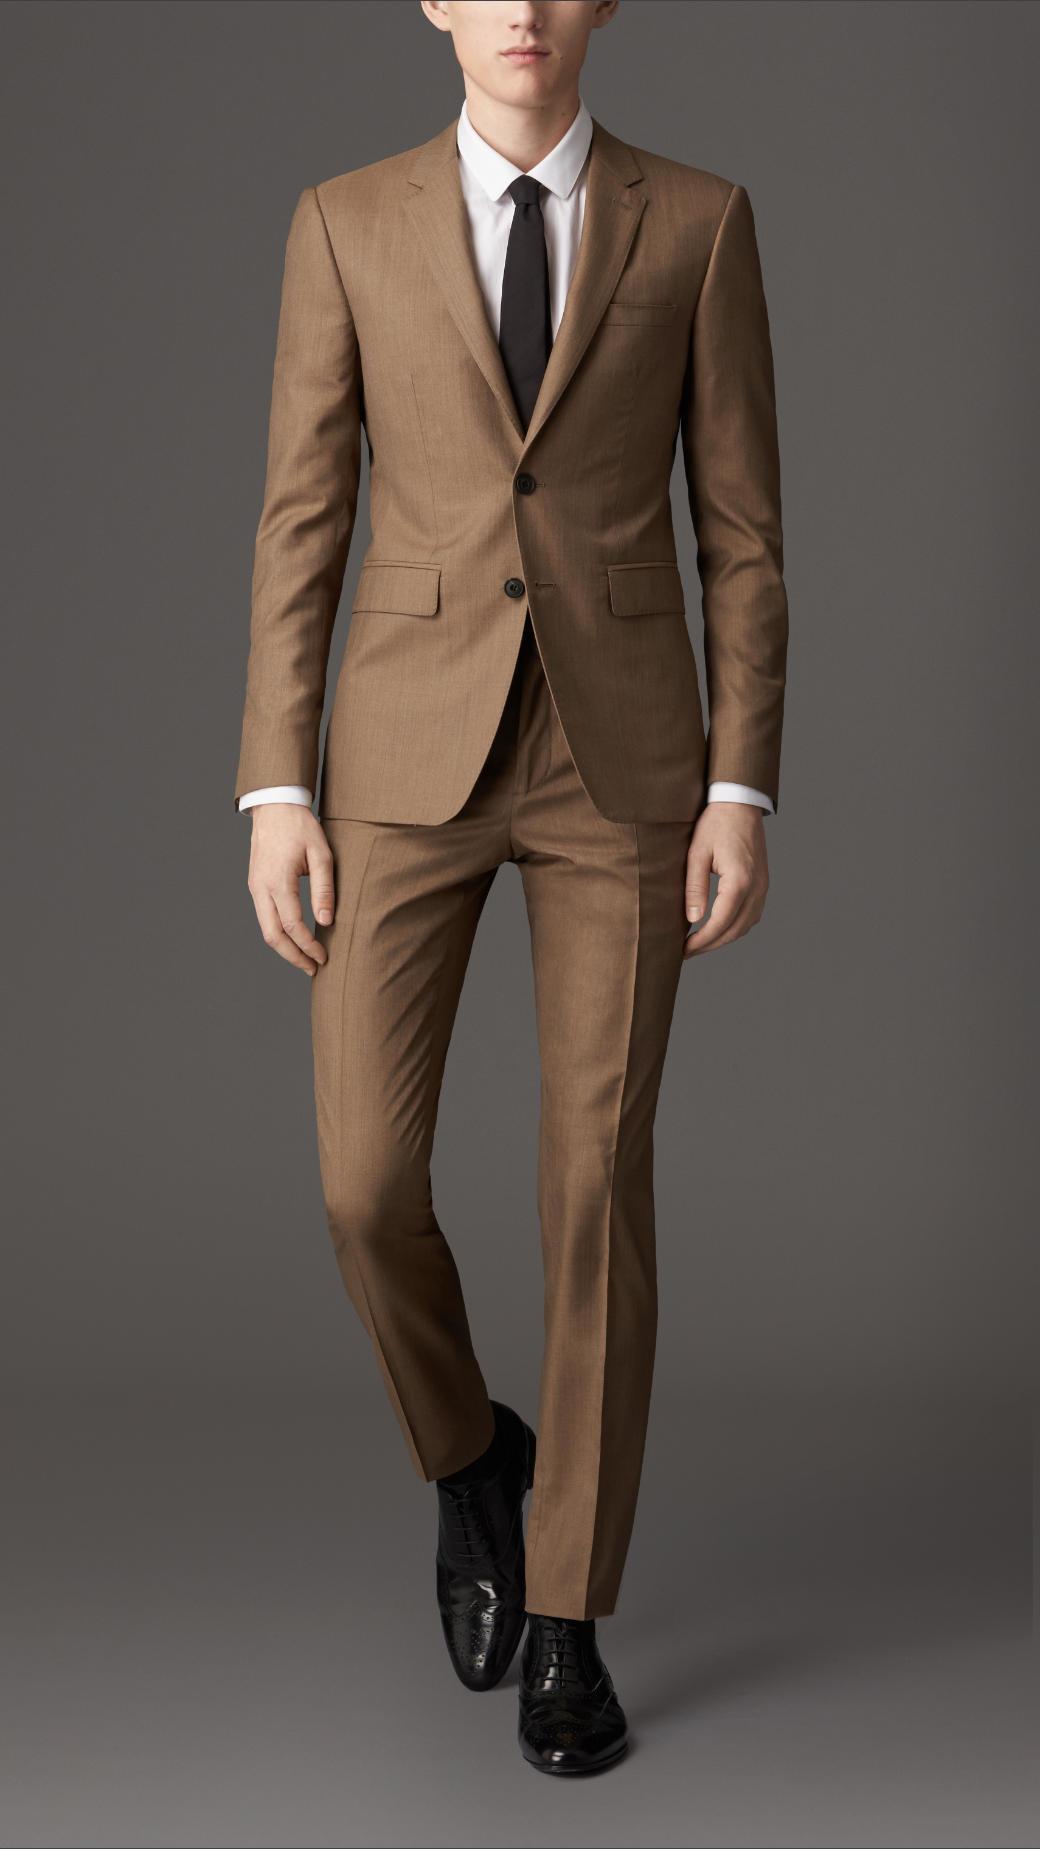 Camel Brown Suit | My Dress Tip